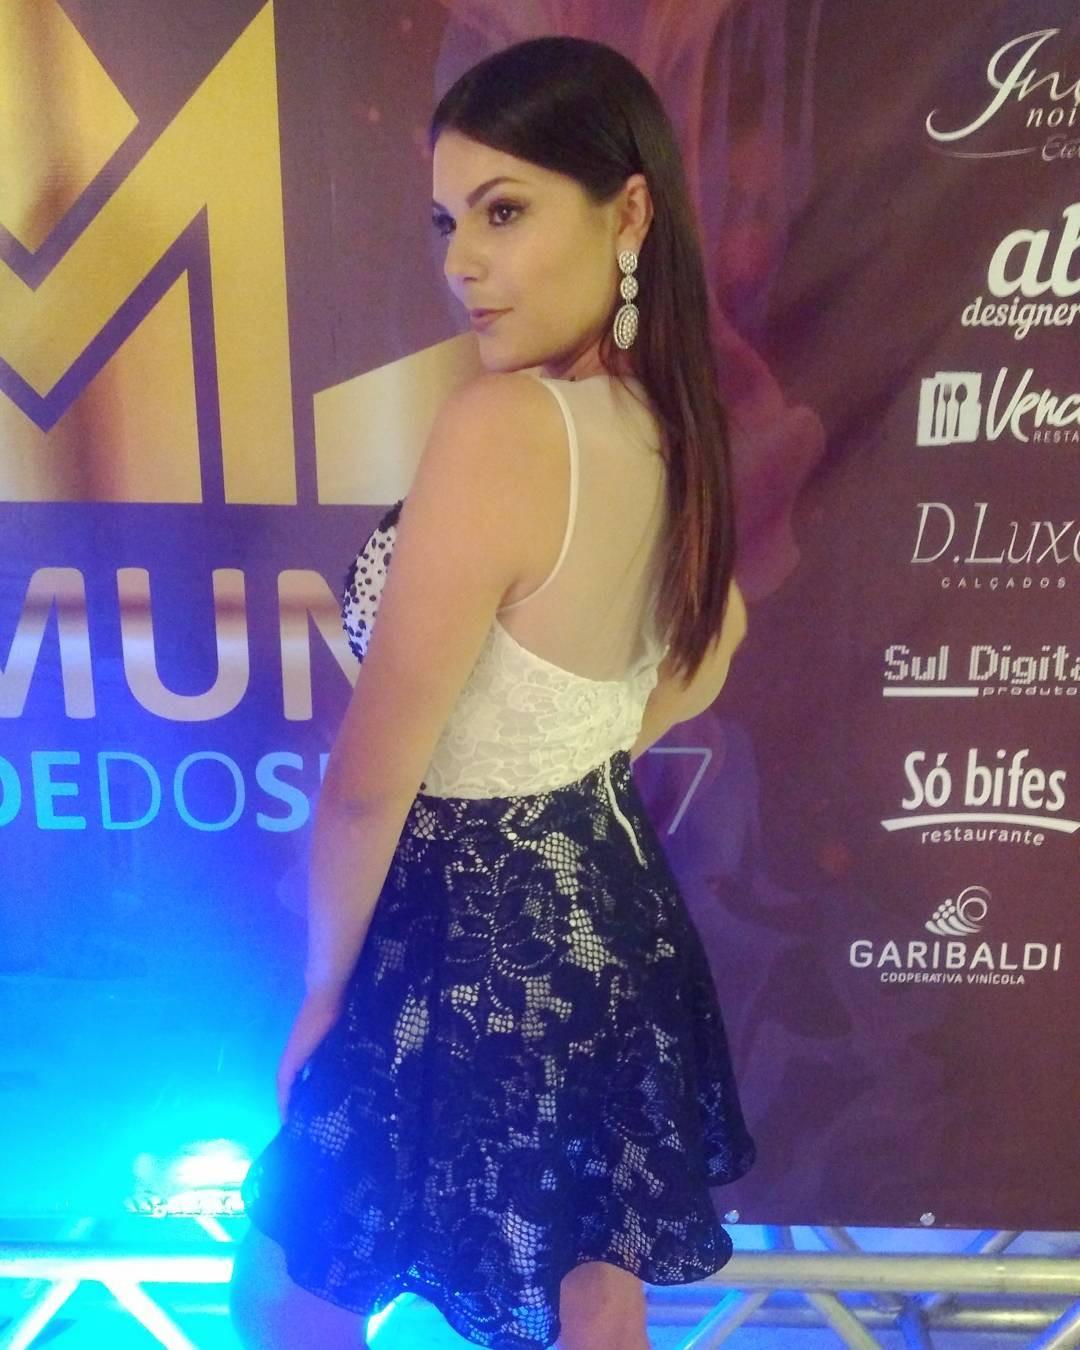 jessica poeta lirio, miss friendship brazil 2021/top 10 de miss tourism queen international 2015. - Página 5 Bz73nr10